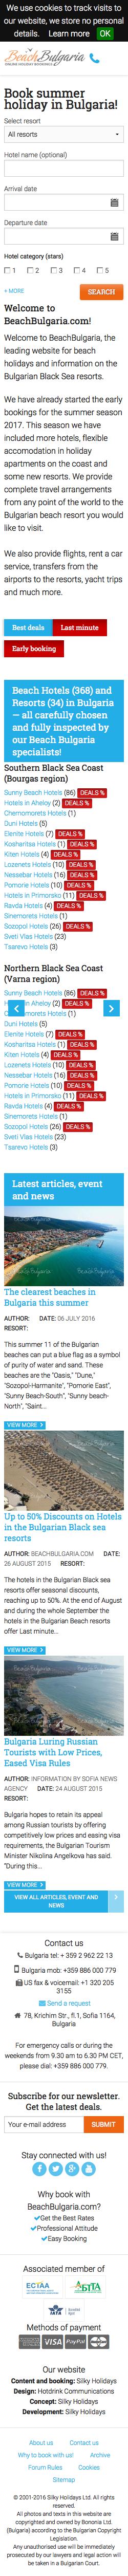 BeachBulgaria